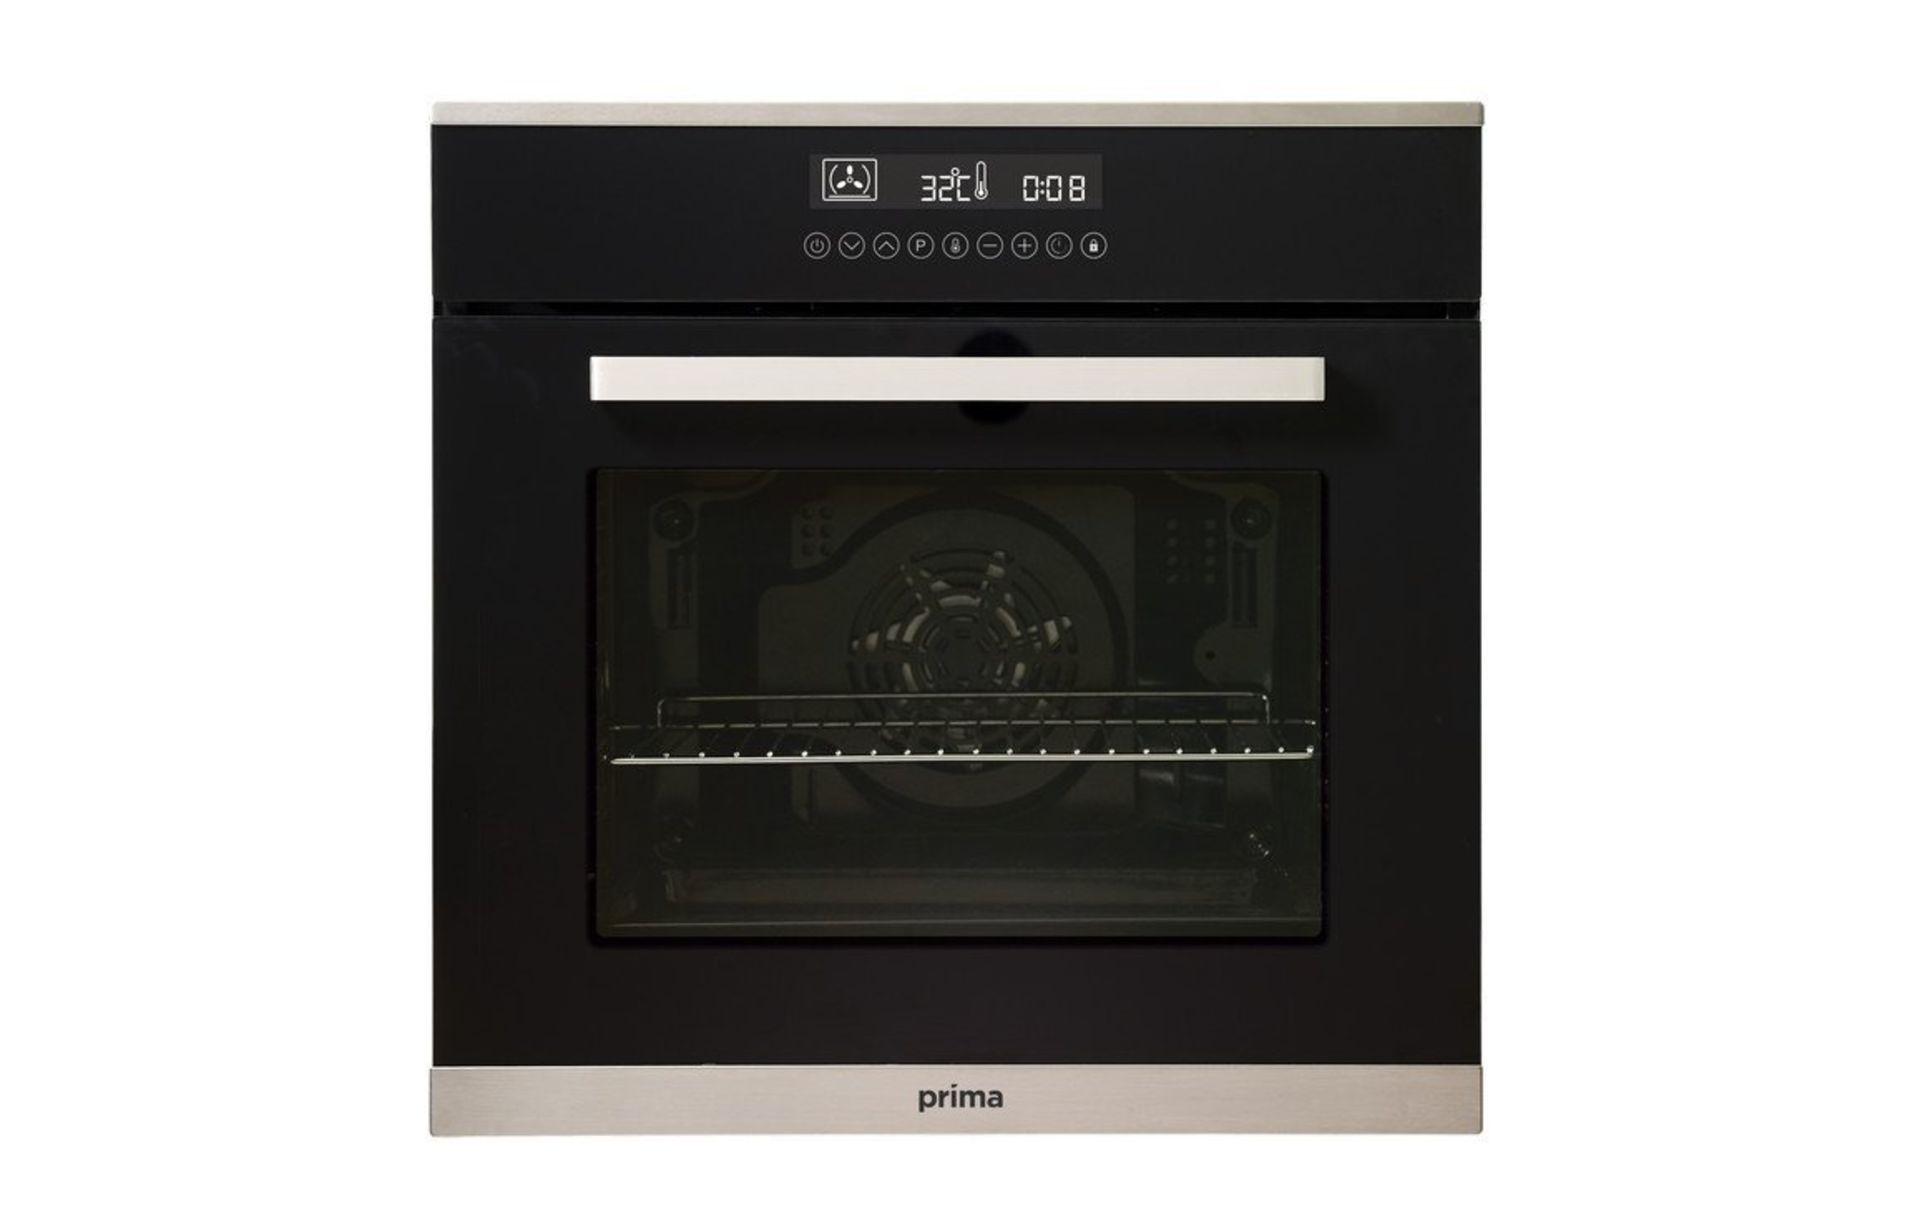 Lot 673 - (KA28) Prima+ PRSO108 B/I Single Electric Fan Oven - Black & St/Steel by Prima RRP £387.68 A...